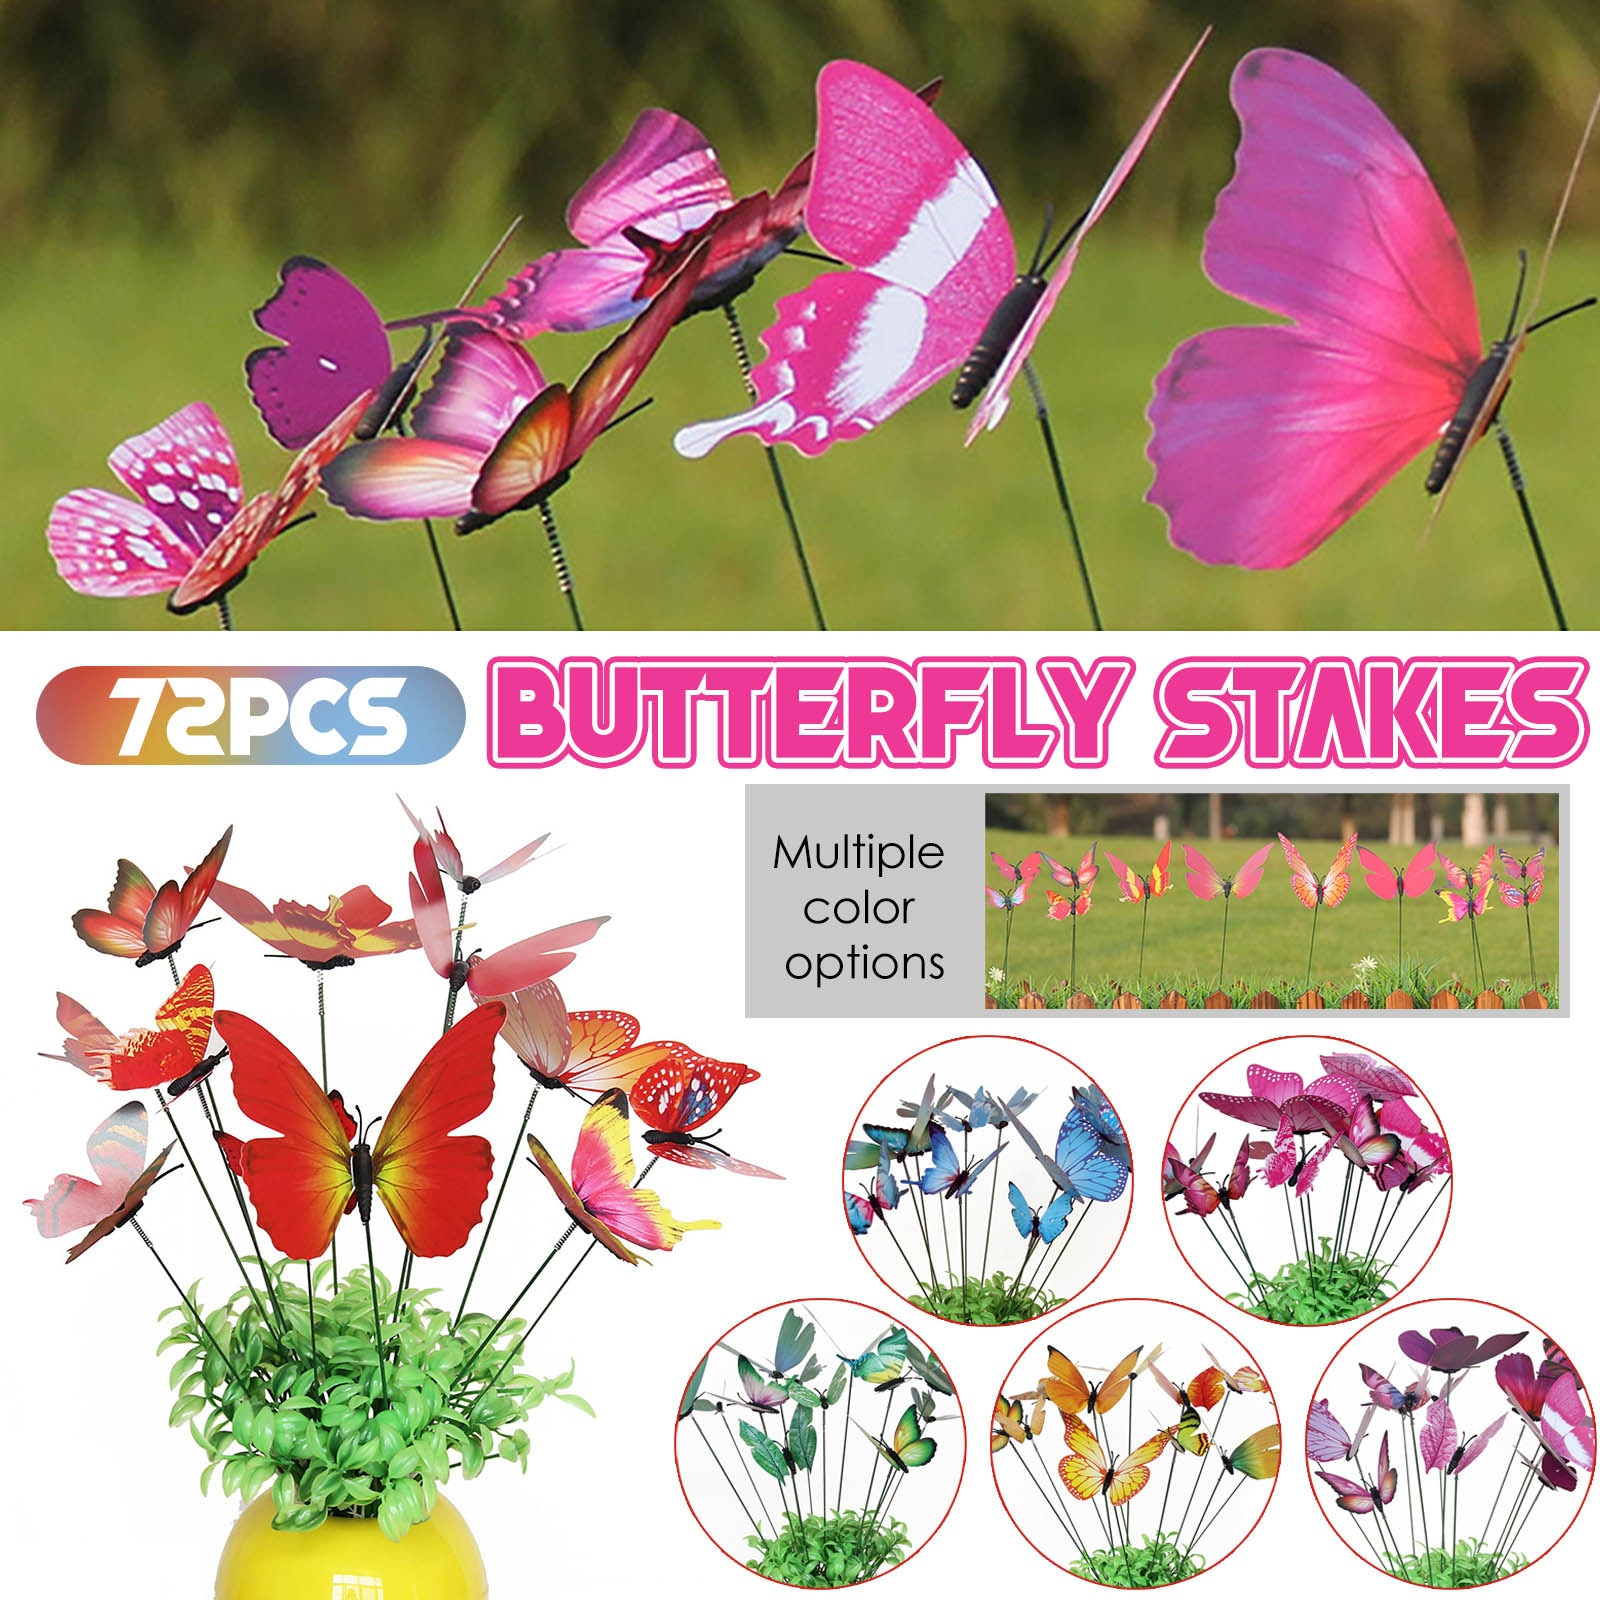 2021 Funny Creative Garden Decoration Outdoor 72pcs Butterfly Stakes Outdoor Yard Planter Flower Pot Bed Garden Decor Yard Art